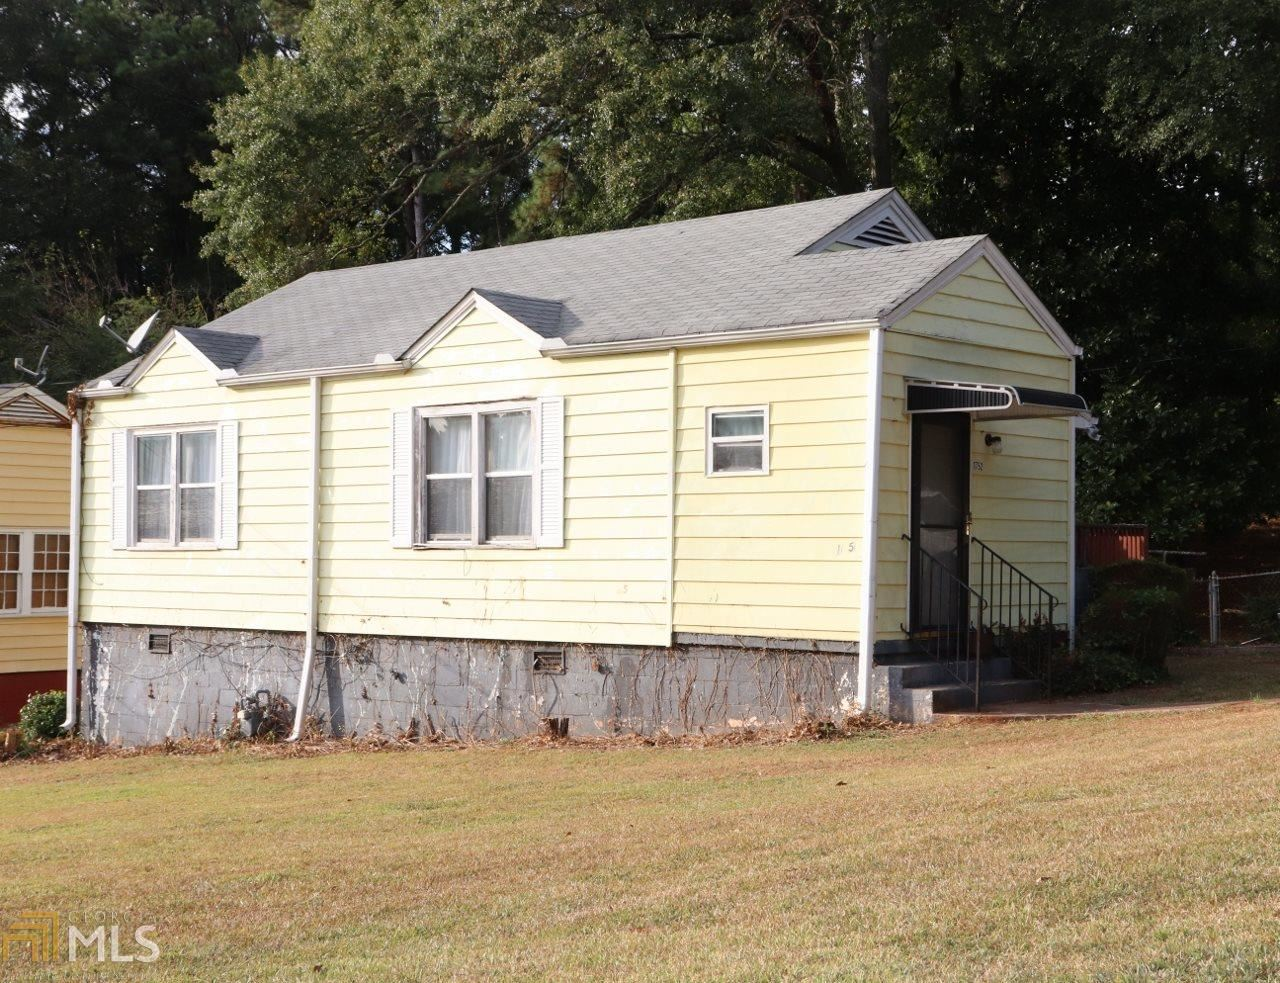 1752 Terry Mill Rd, Atlanta, GA 30316 - MLS#: 8686436